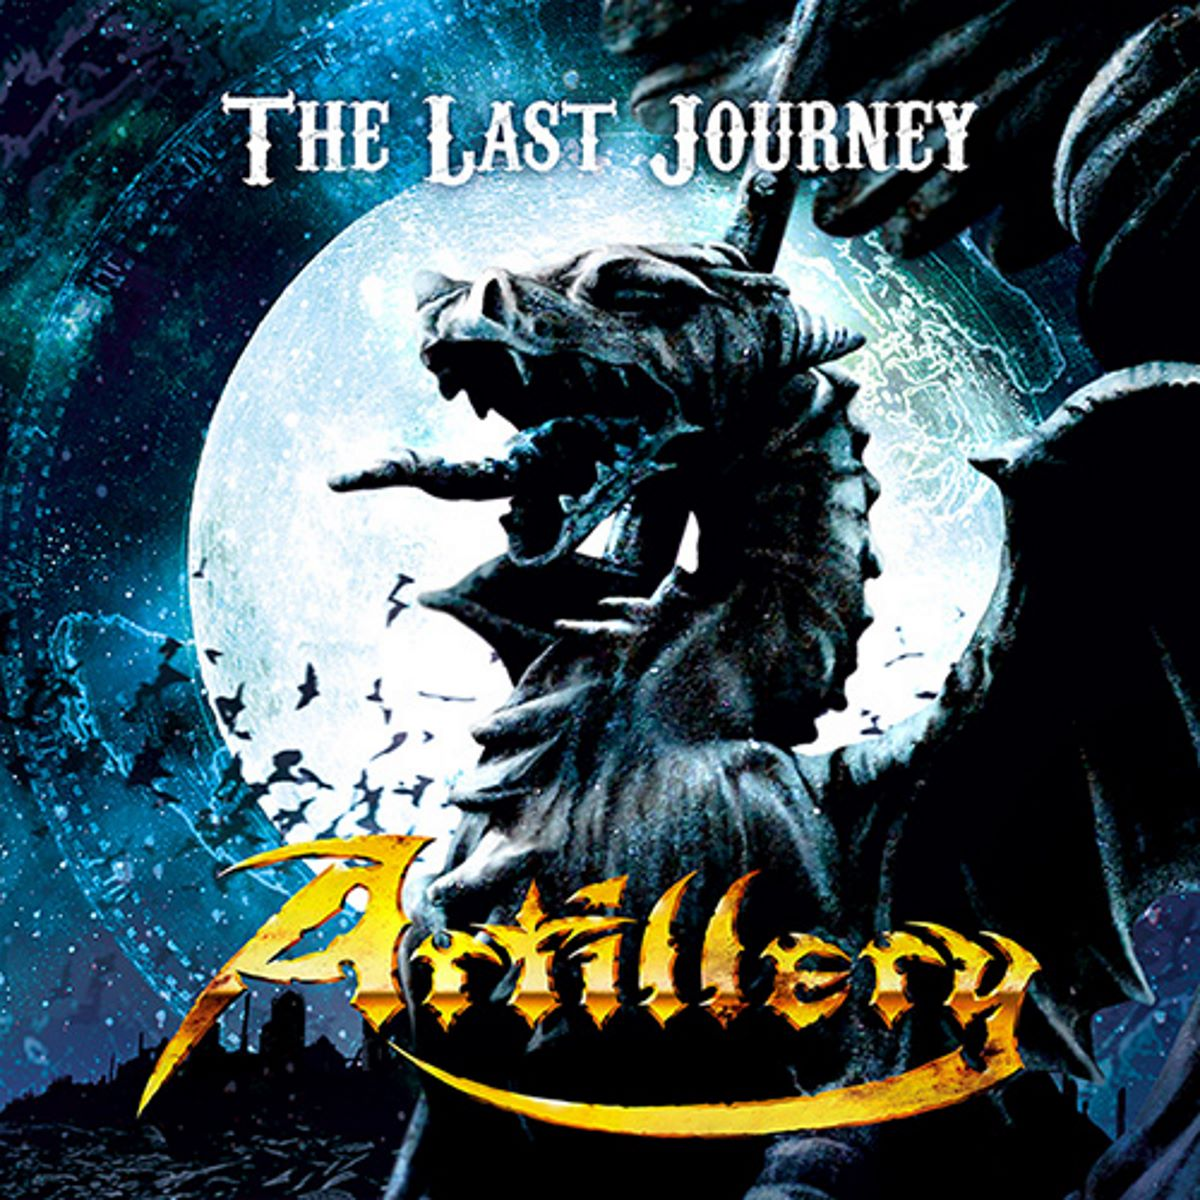 Artillery - The Last Journey - single cover